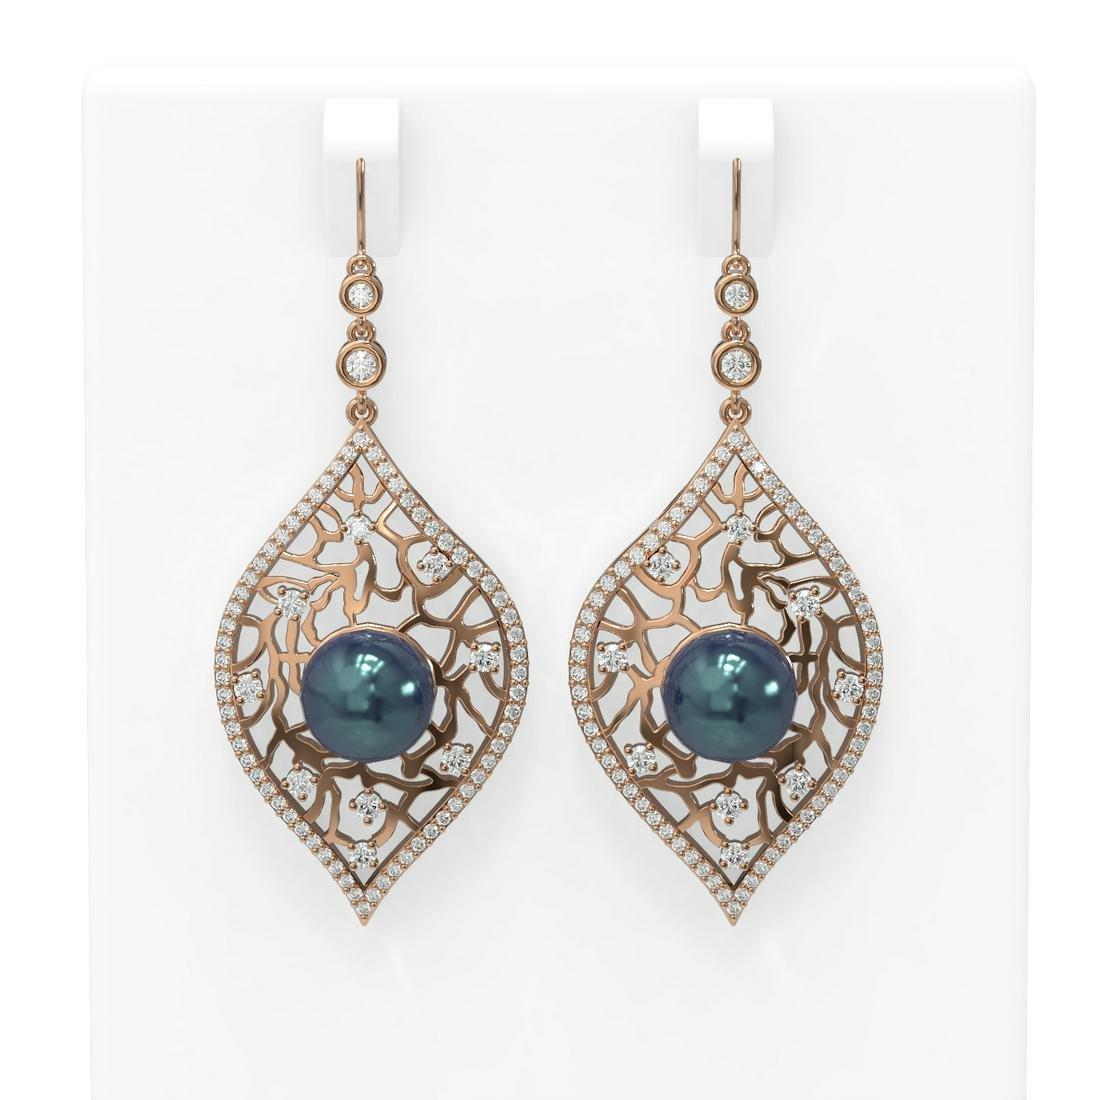 2.78 ctw Diamond & Pearl Earrings 18K Rose Gold -